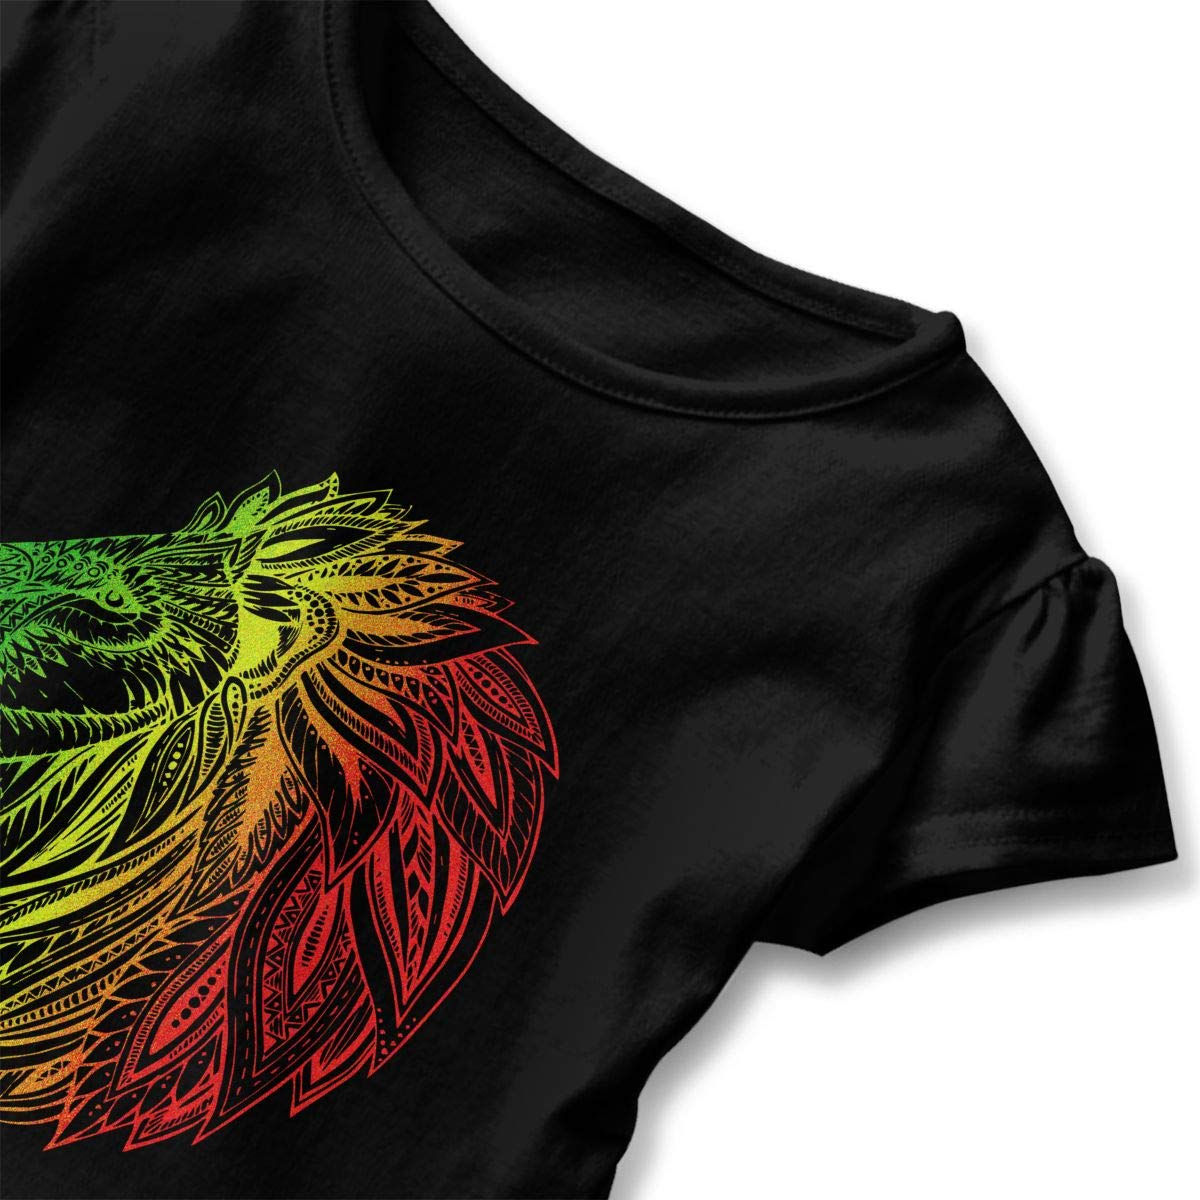 Cheng Jian Bo Rasta Reggae Lion Toddler Girls T Shirt Kids Cotton Short Sleeve Ruffle Tee